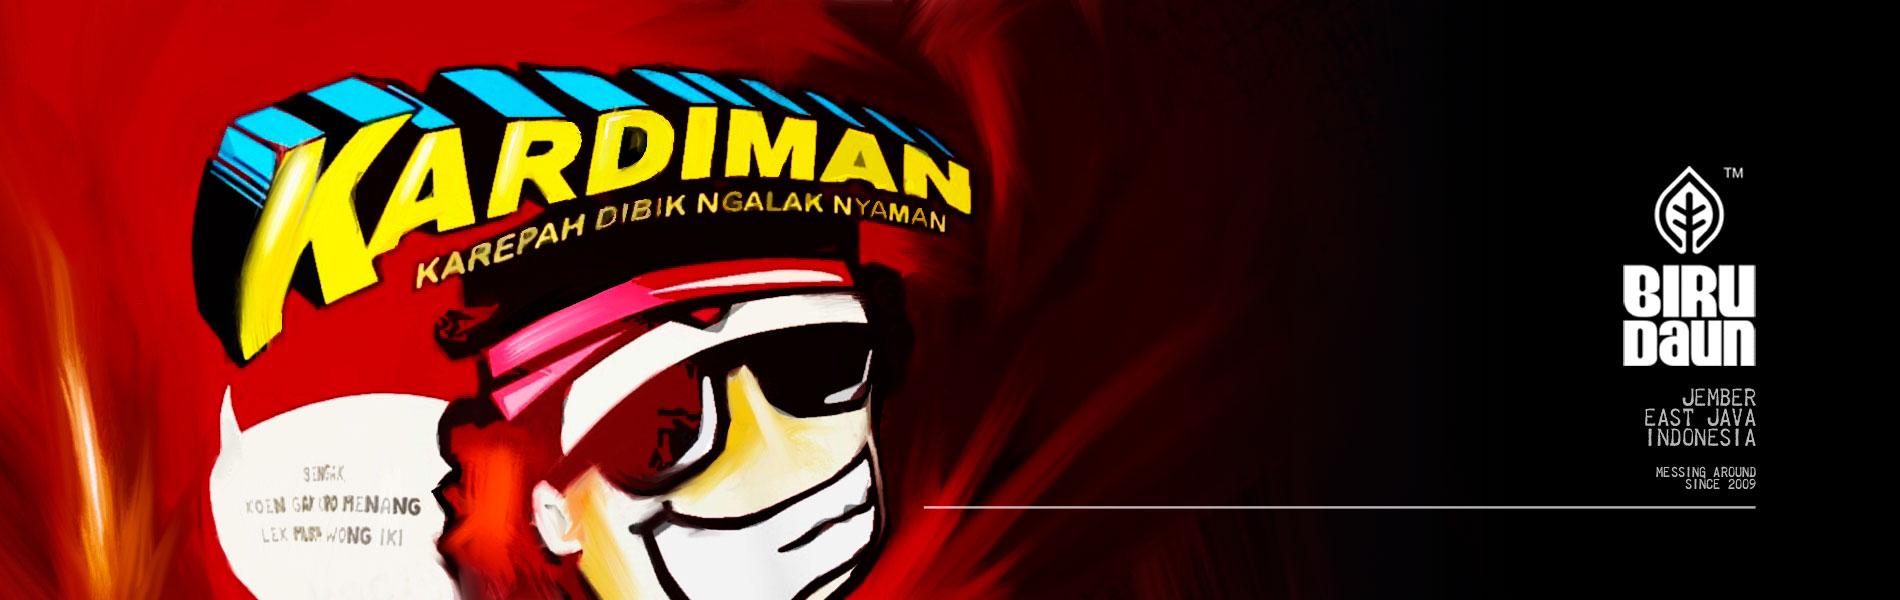 banner-web-1900x600-KARDIMAN-FIX